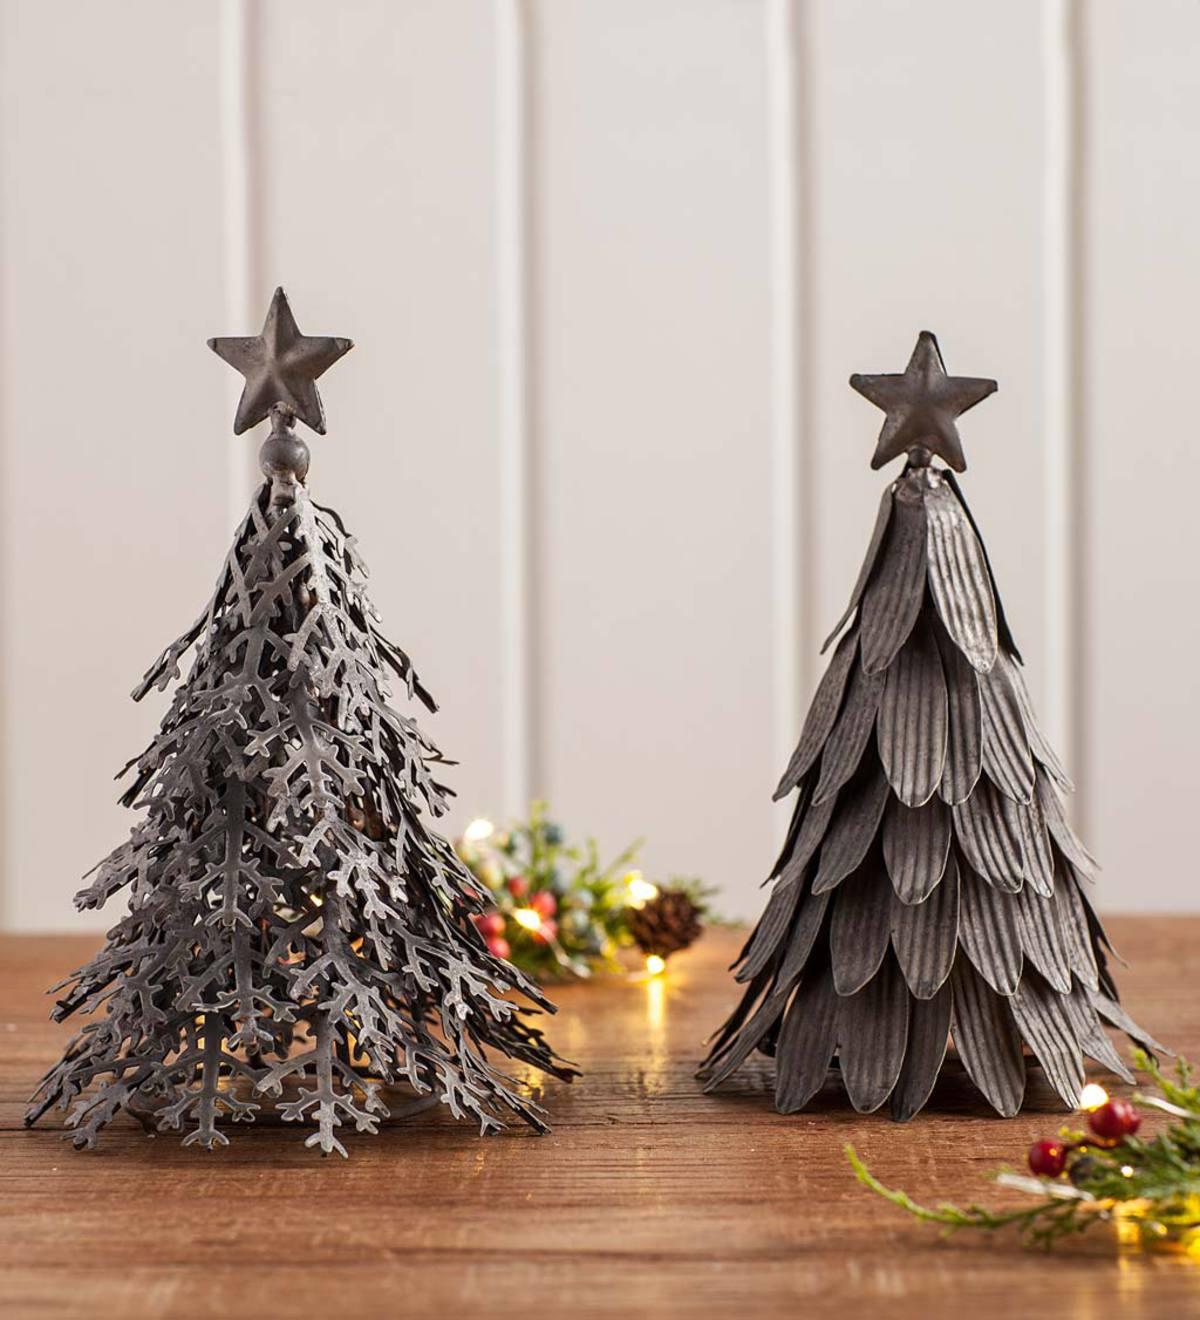 Galvanized Metal Tin Pine Christmas Tree Farmhouse Lodge Votive Candle Holders